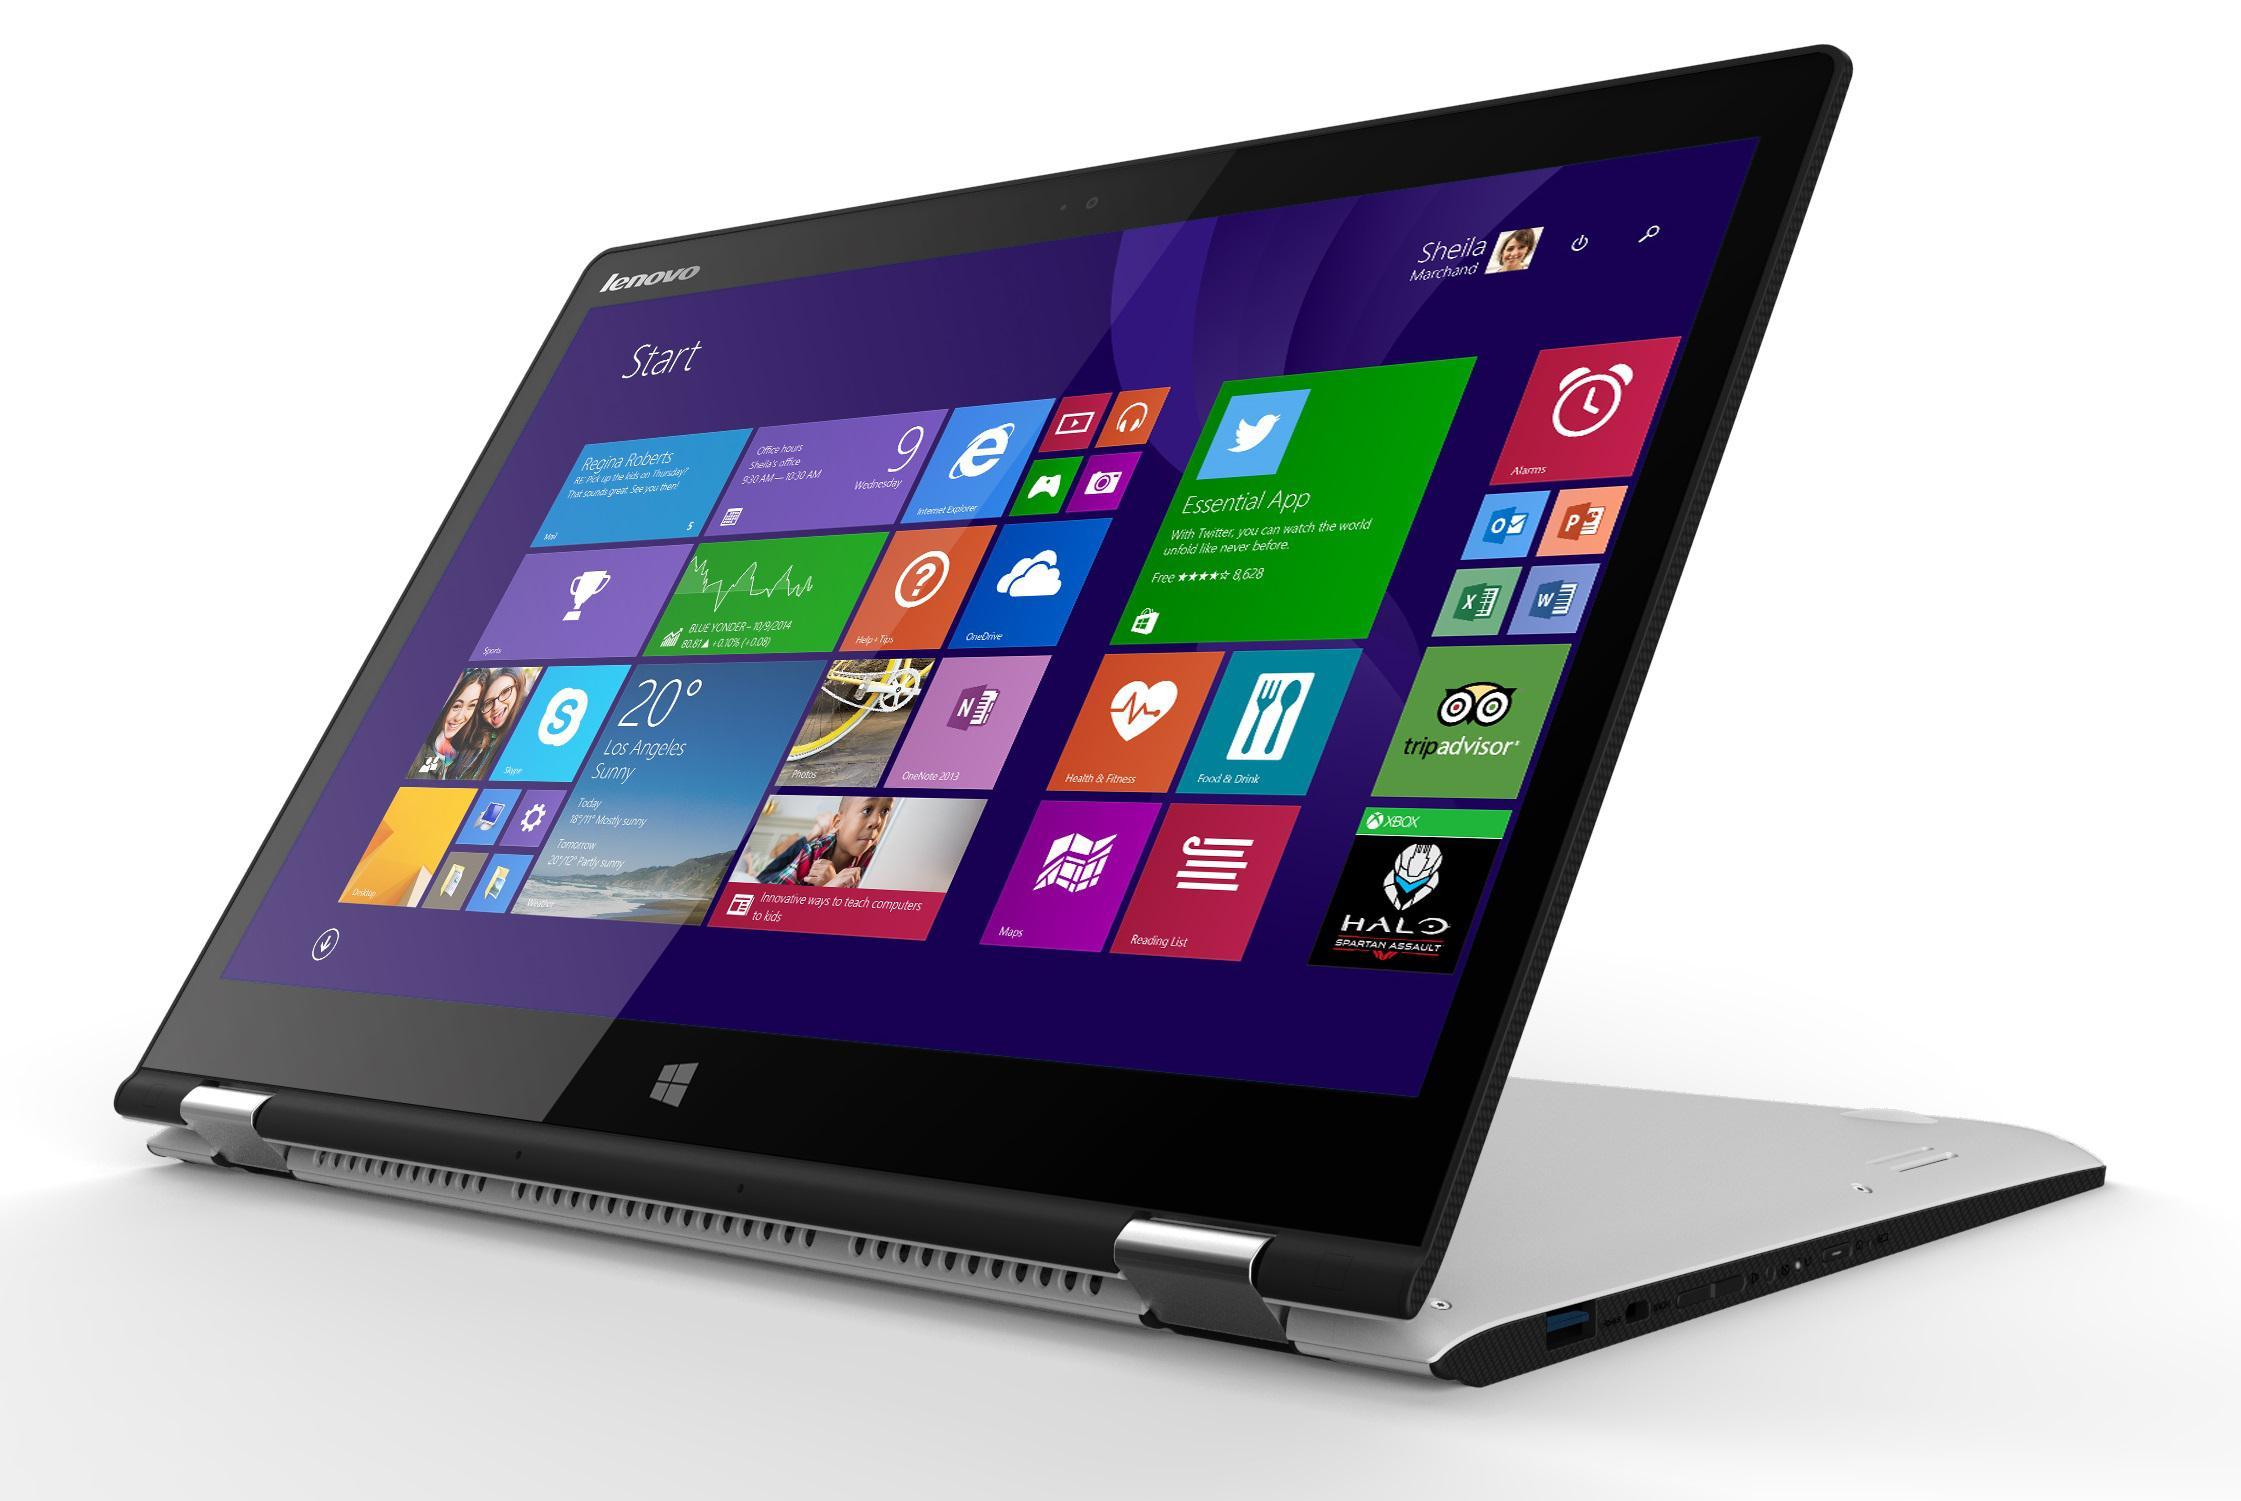 "PC Portable Convertible Tactile 14"" Lenovo Yoga 3 14 (Intel Core i3, 4Go RAM, HDD 500 Go + 8 Go SSD, GeForce G940M)"